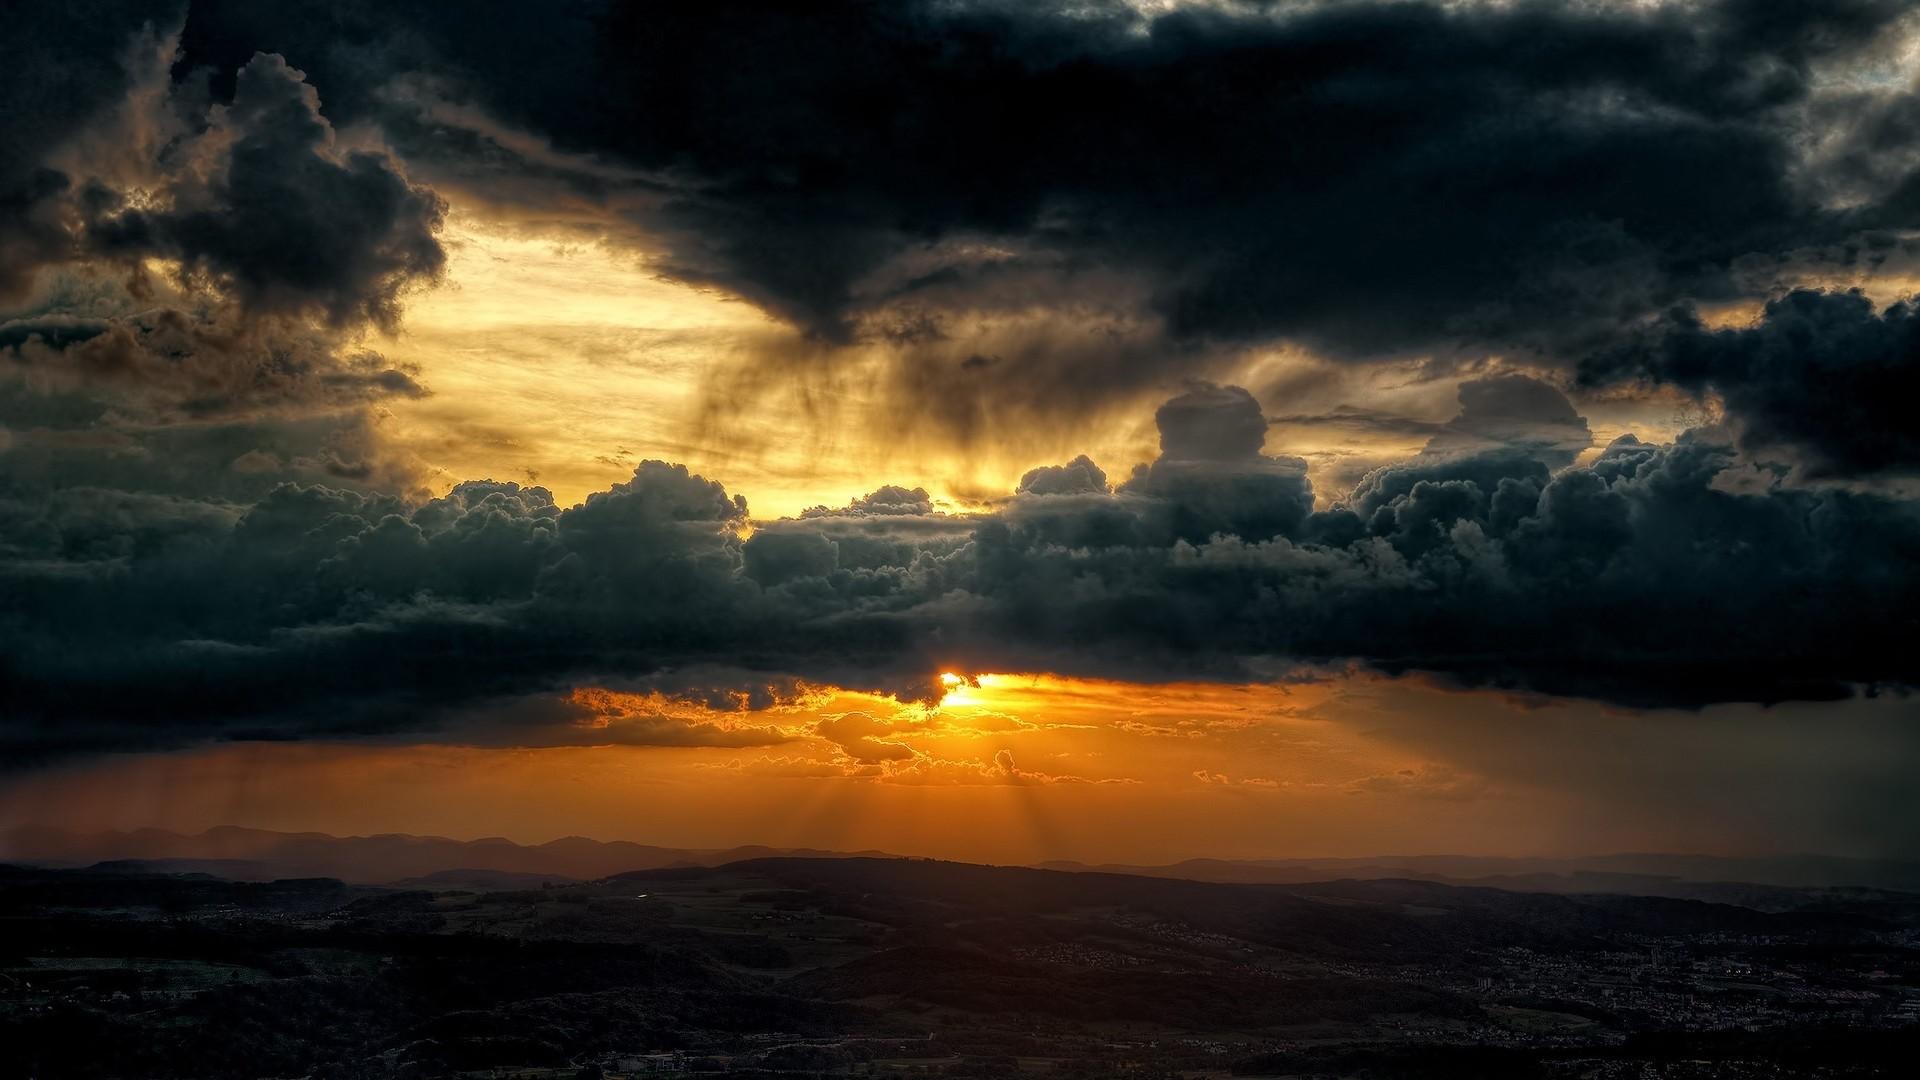 Res: 1920x1080, Dark Clouds Wallpaper HD  #5490